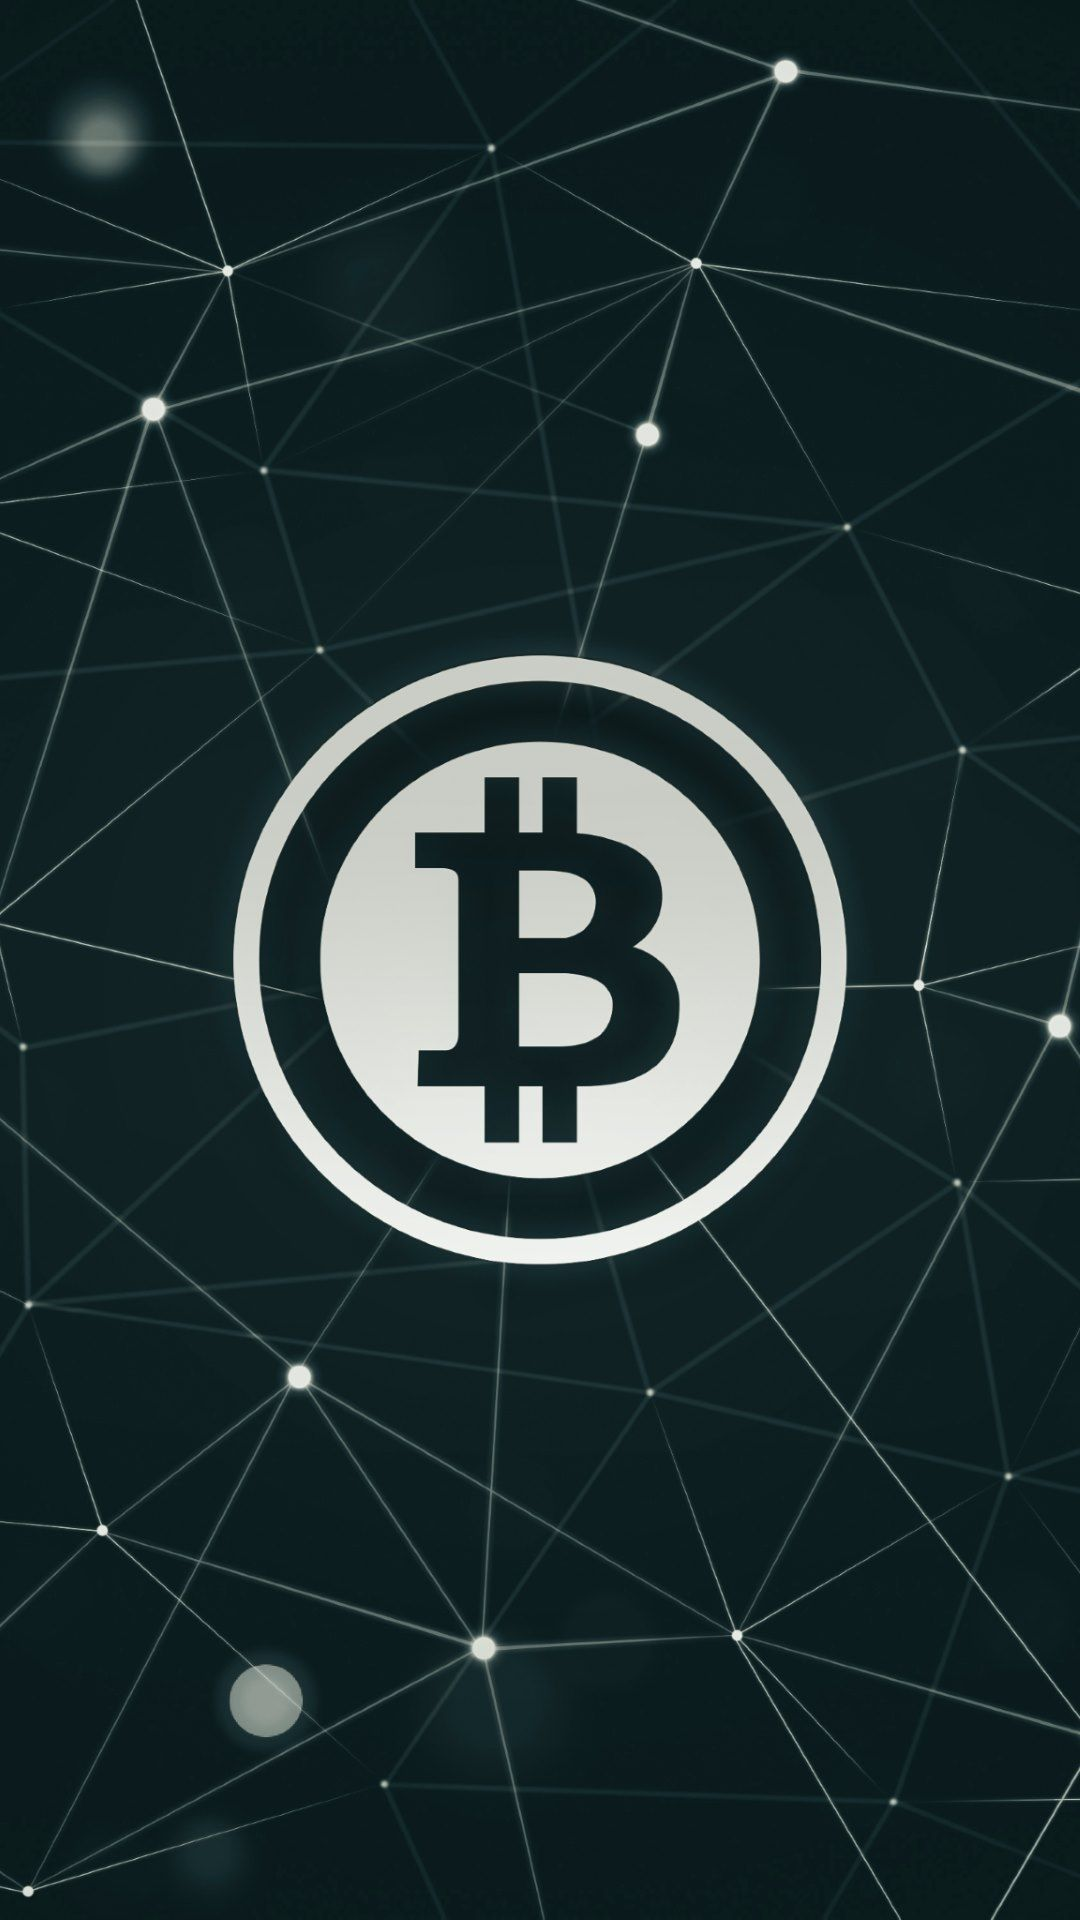 bitcoin trader de shakira bitcoin trading oglinda zilnică